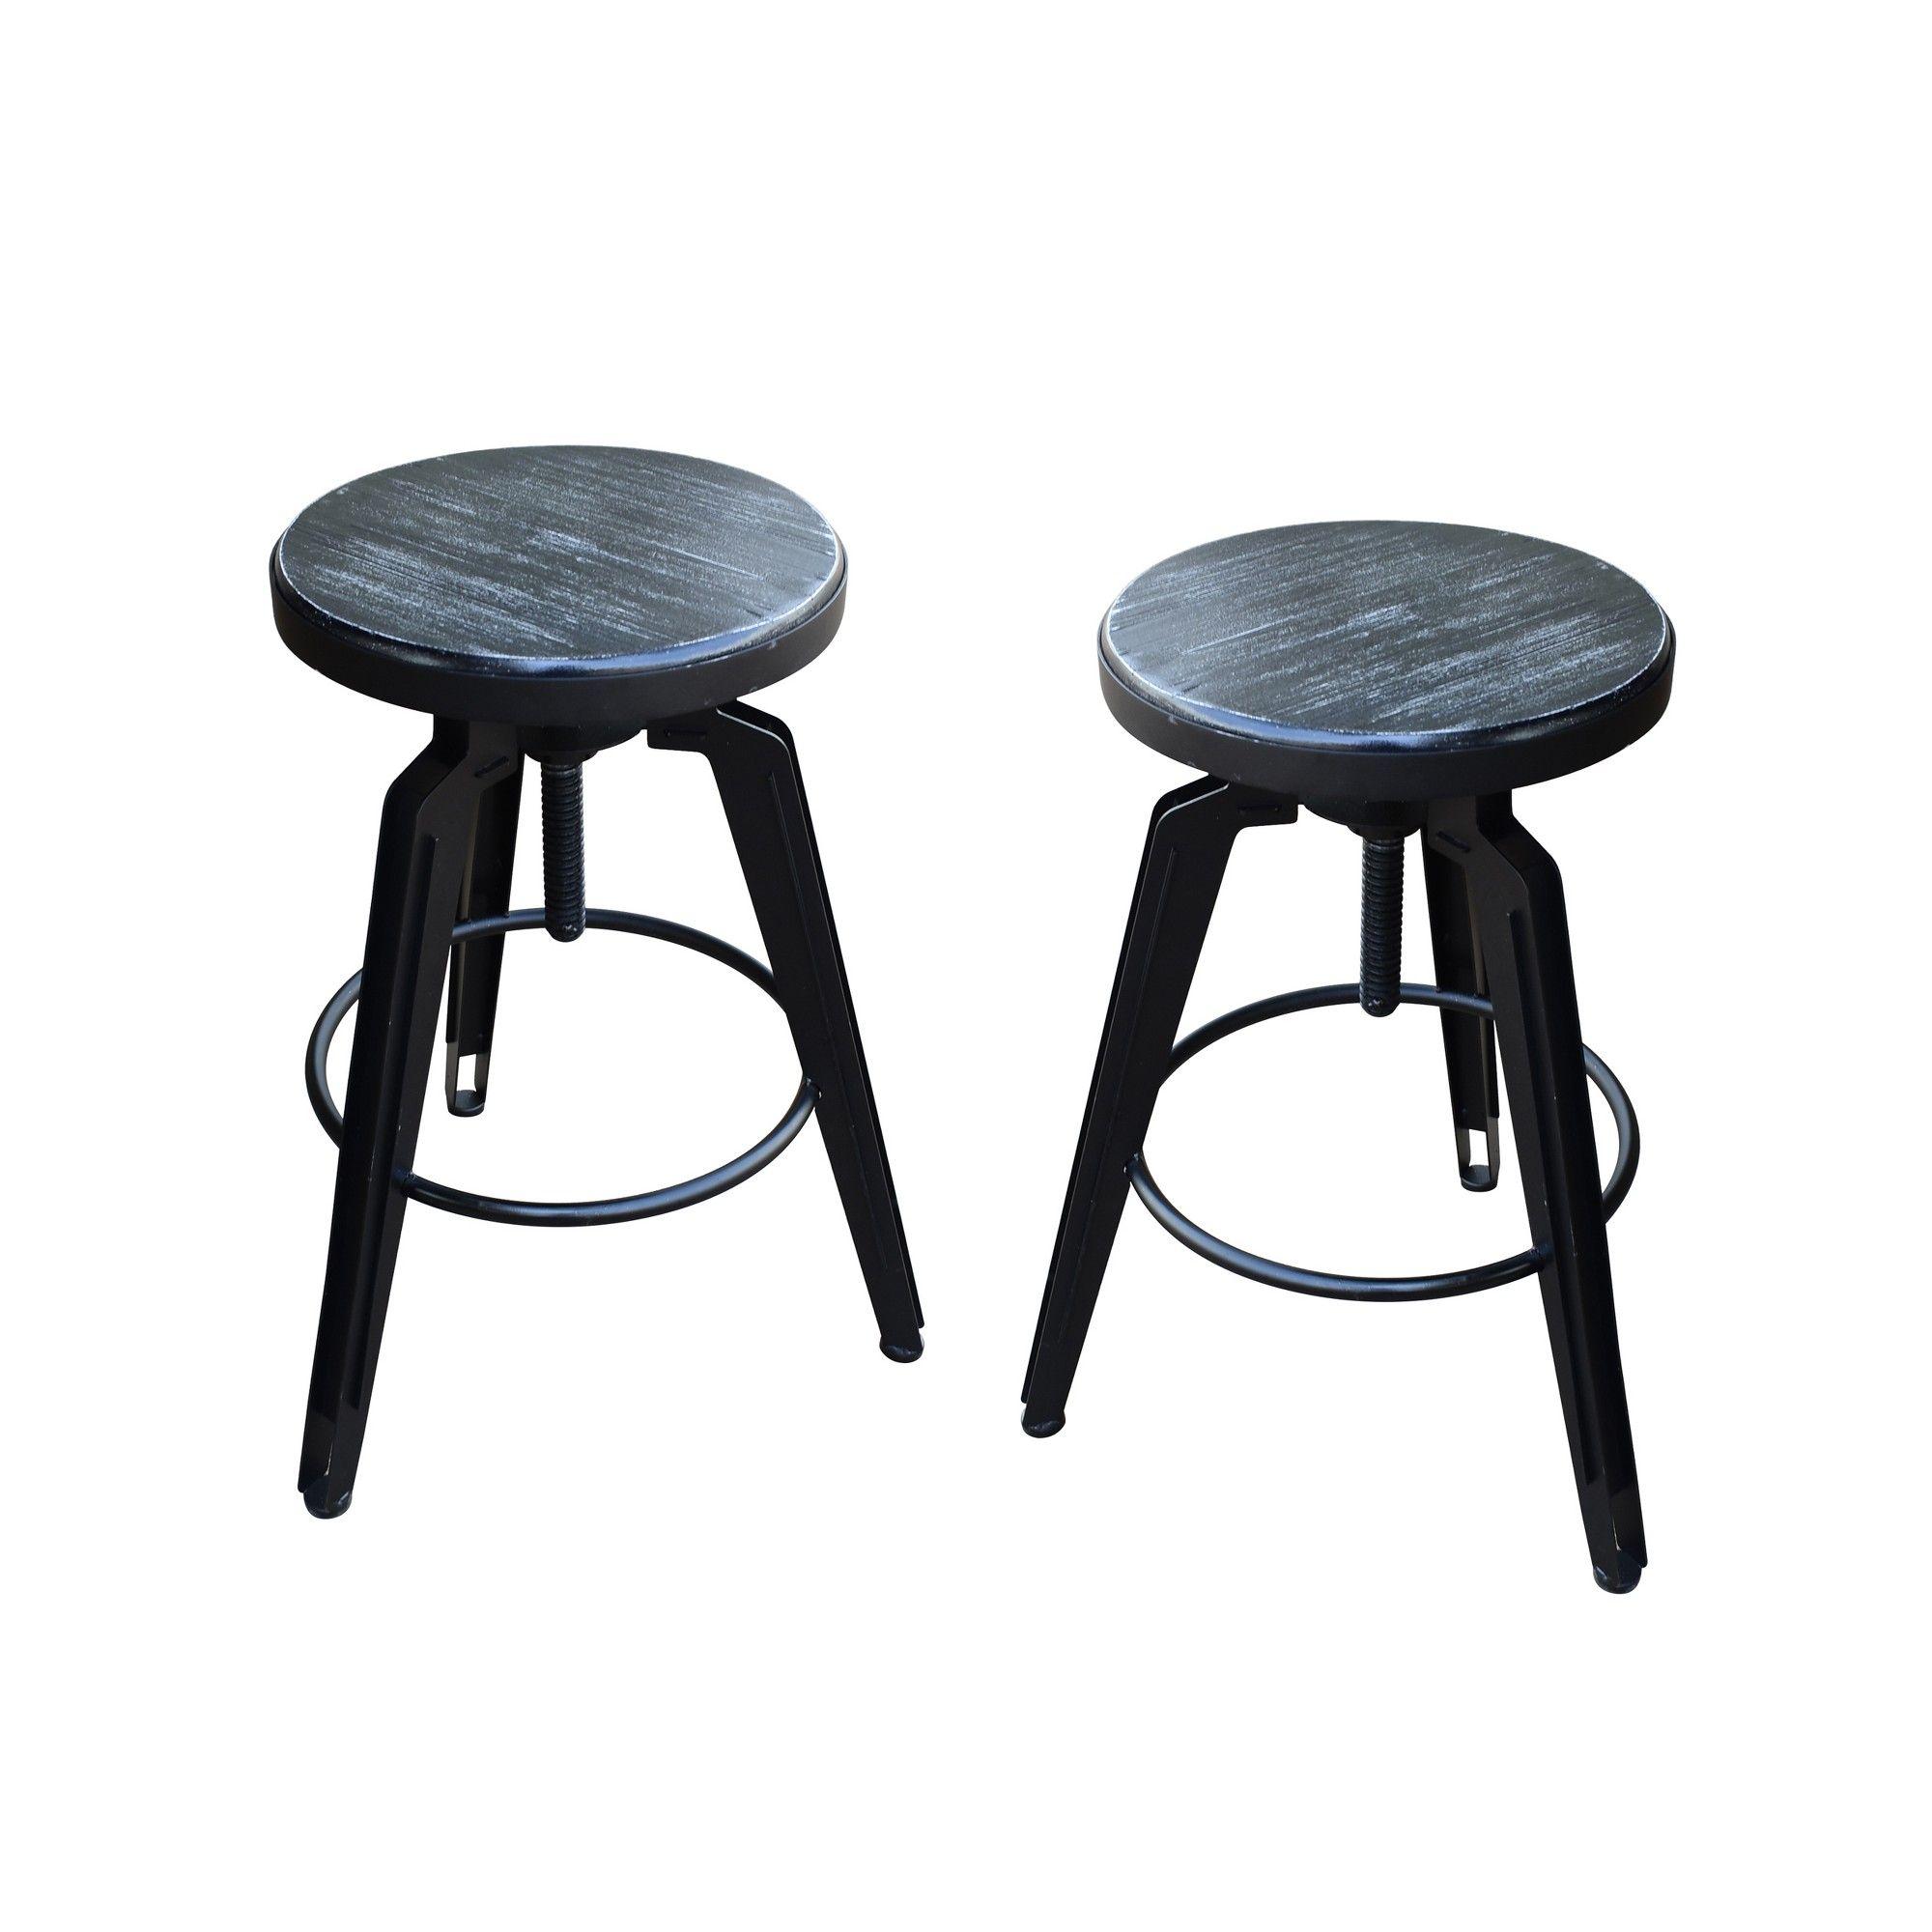 Awe Inspiring Set Of 2 Counter And Bar Stool Dark Gray Christopher Forskolin Free Trial Chair Design Images Forskolin Free Trialorg